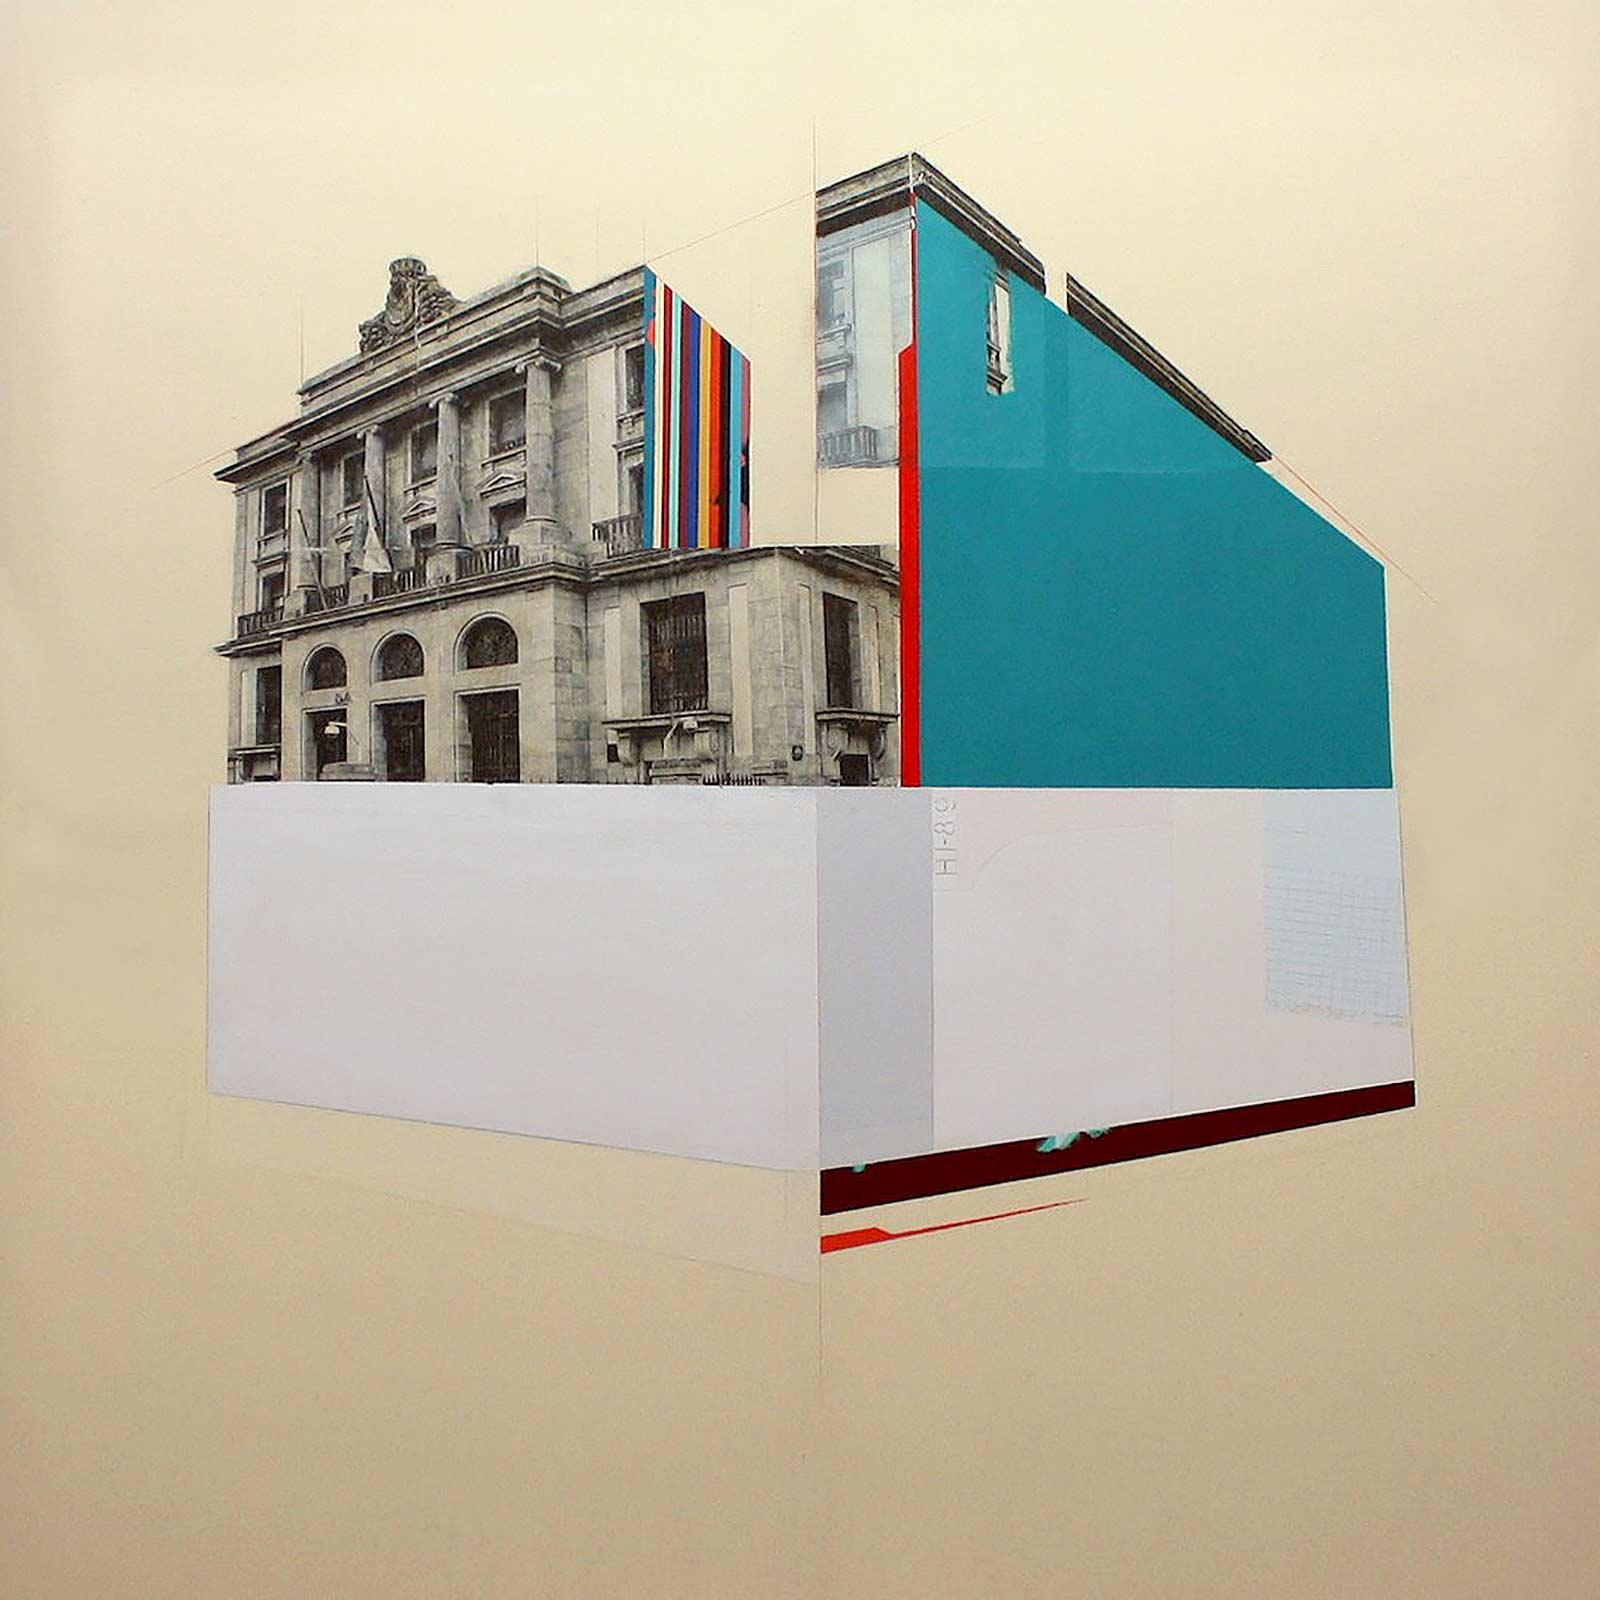 Pep-Llabres-Arte-Contemporari_Rubén-Torras_Deconstrucción-II_Técnica-mixta-sobre-tela_150x150cm_2016-1